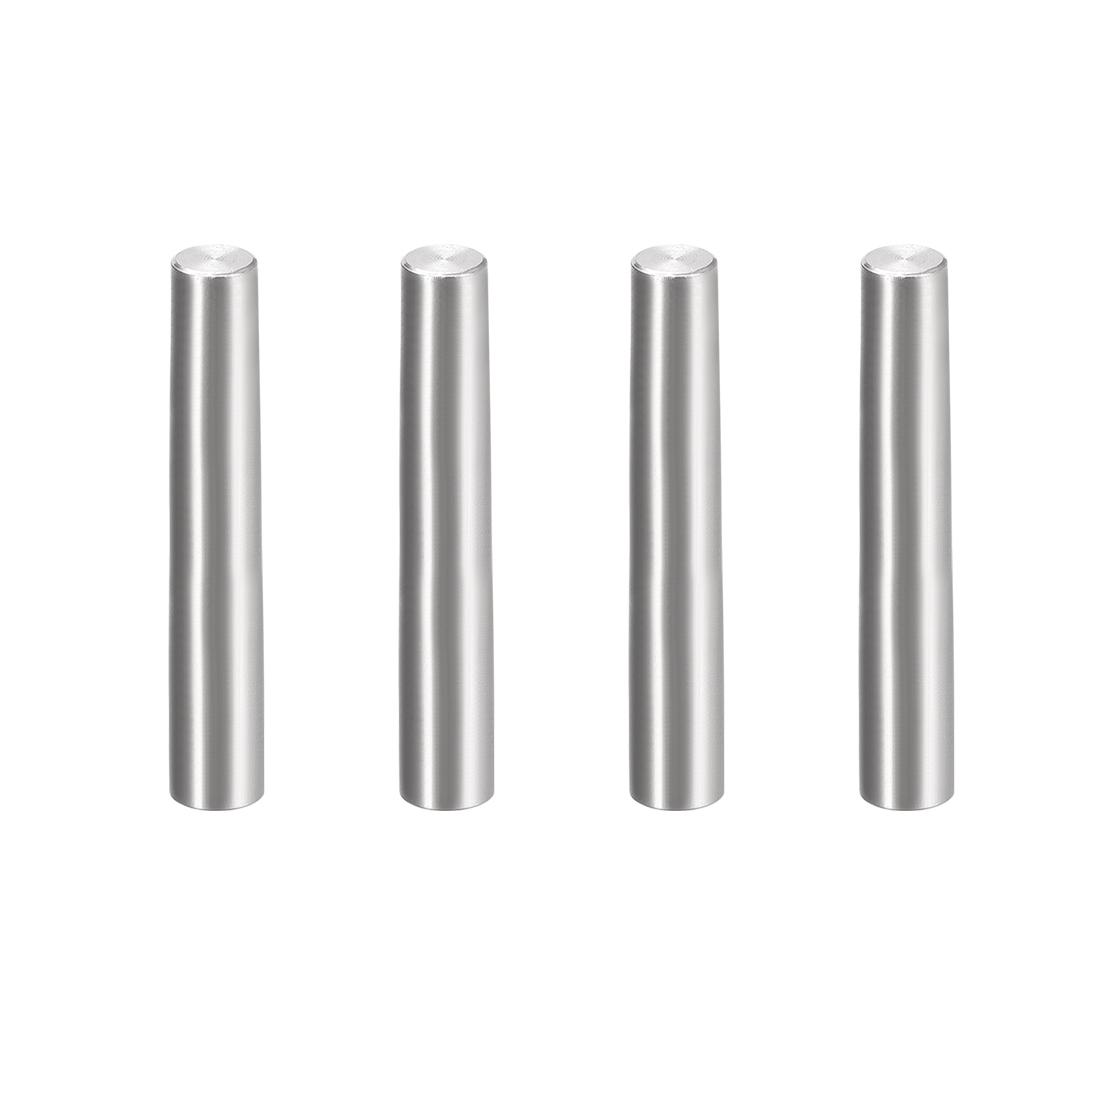 4Pcs 8mm x 60mm 1:50 Taper Pin 304 Stainless Steel Shelf Support Pin Fasten